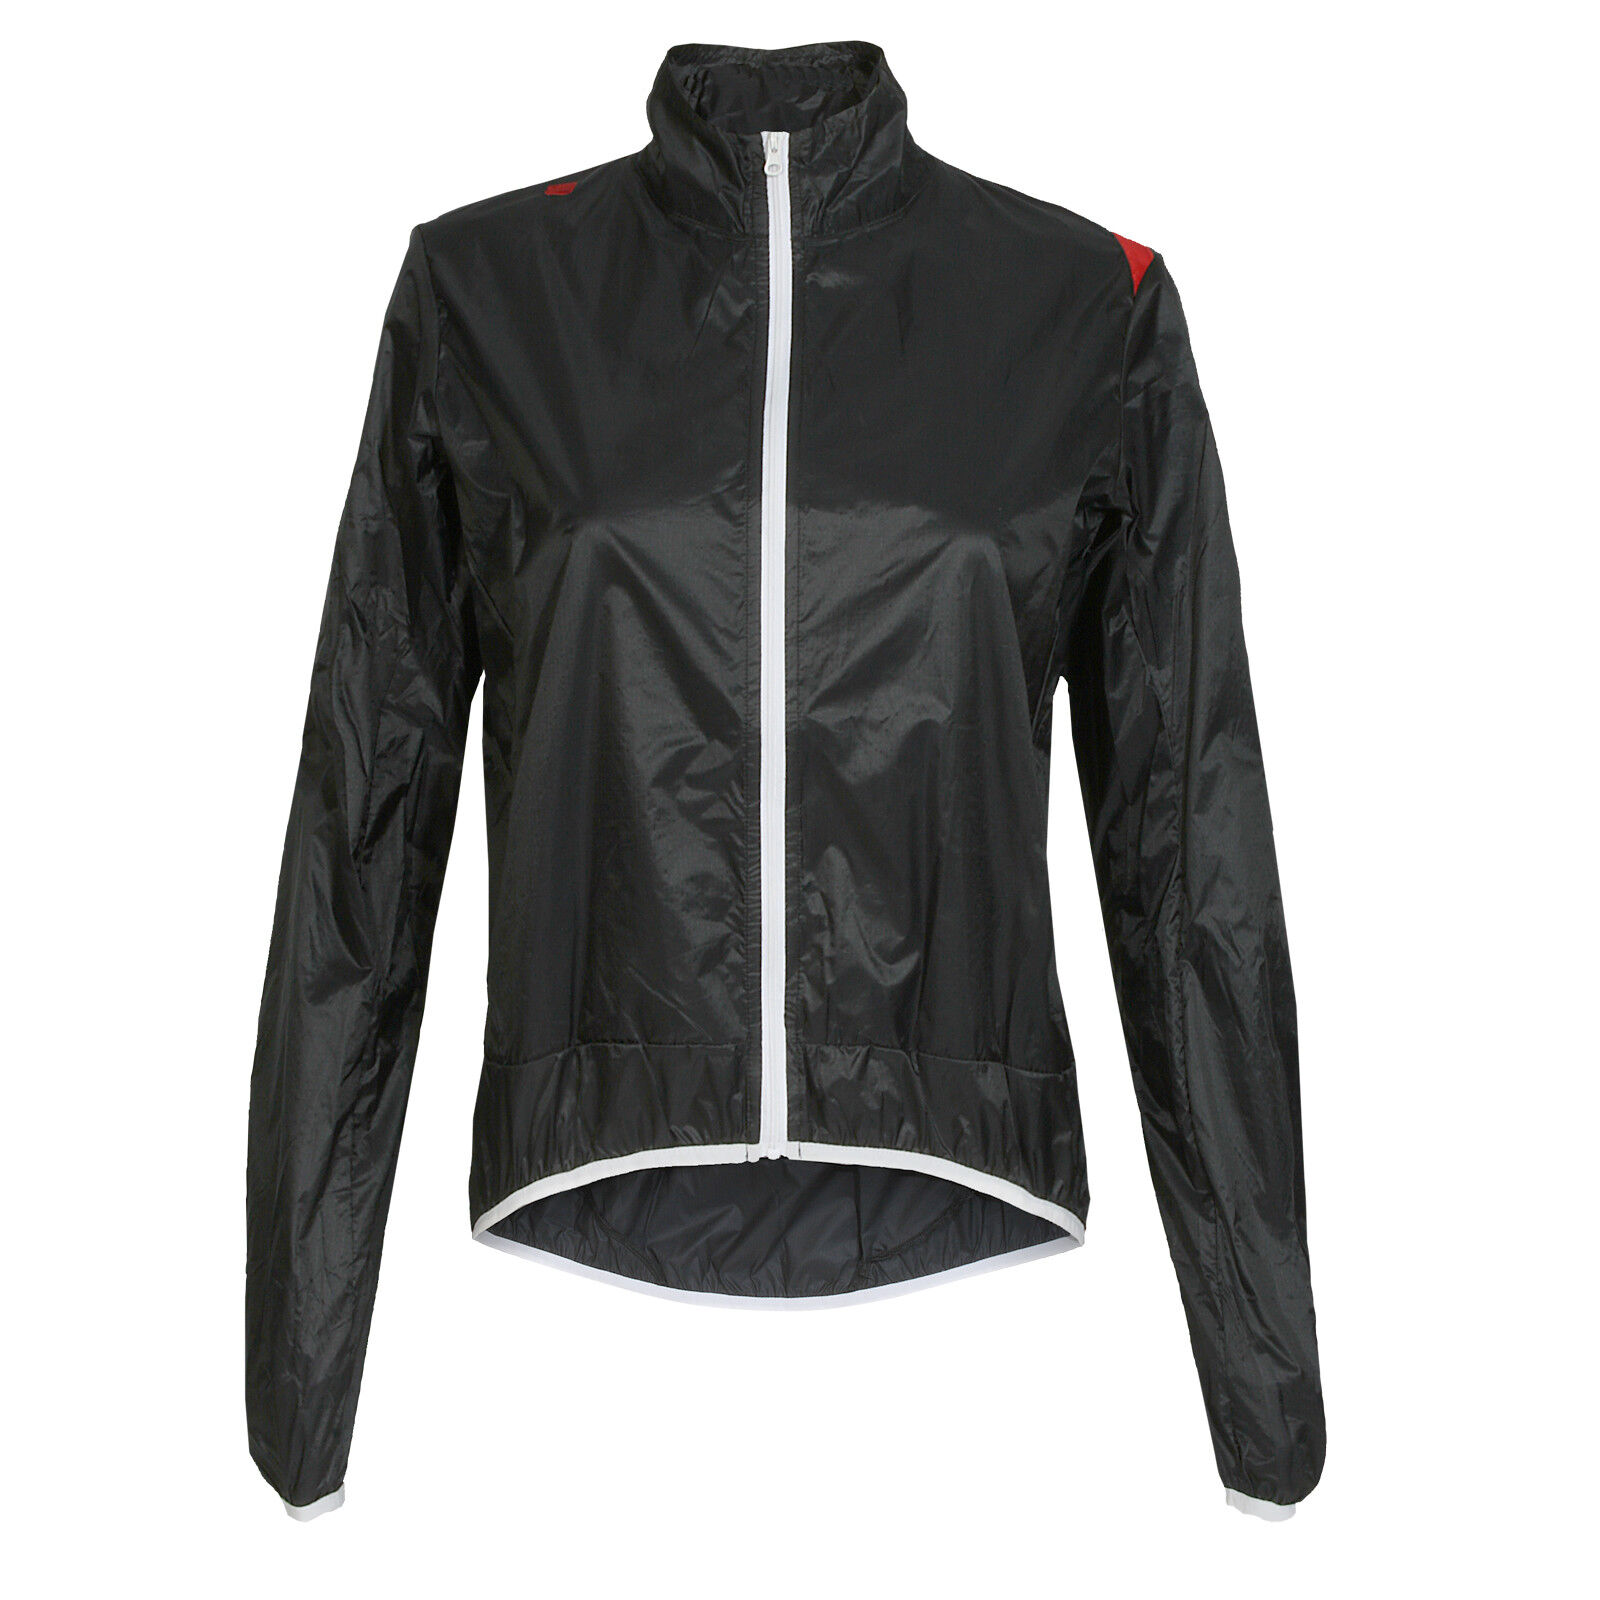 Sportful Donna GIACCA da moto Giacca da pioggia CALDO PACCO W giacca nero